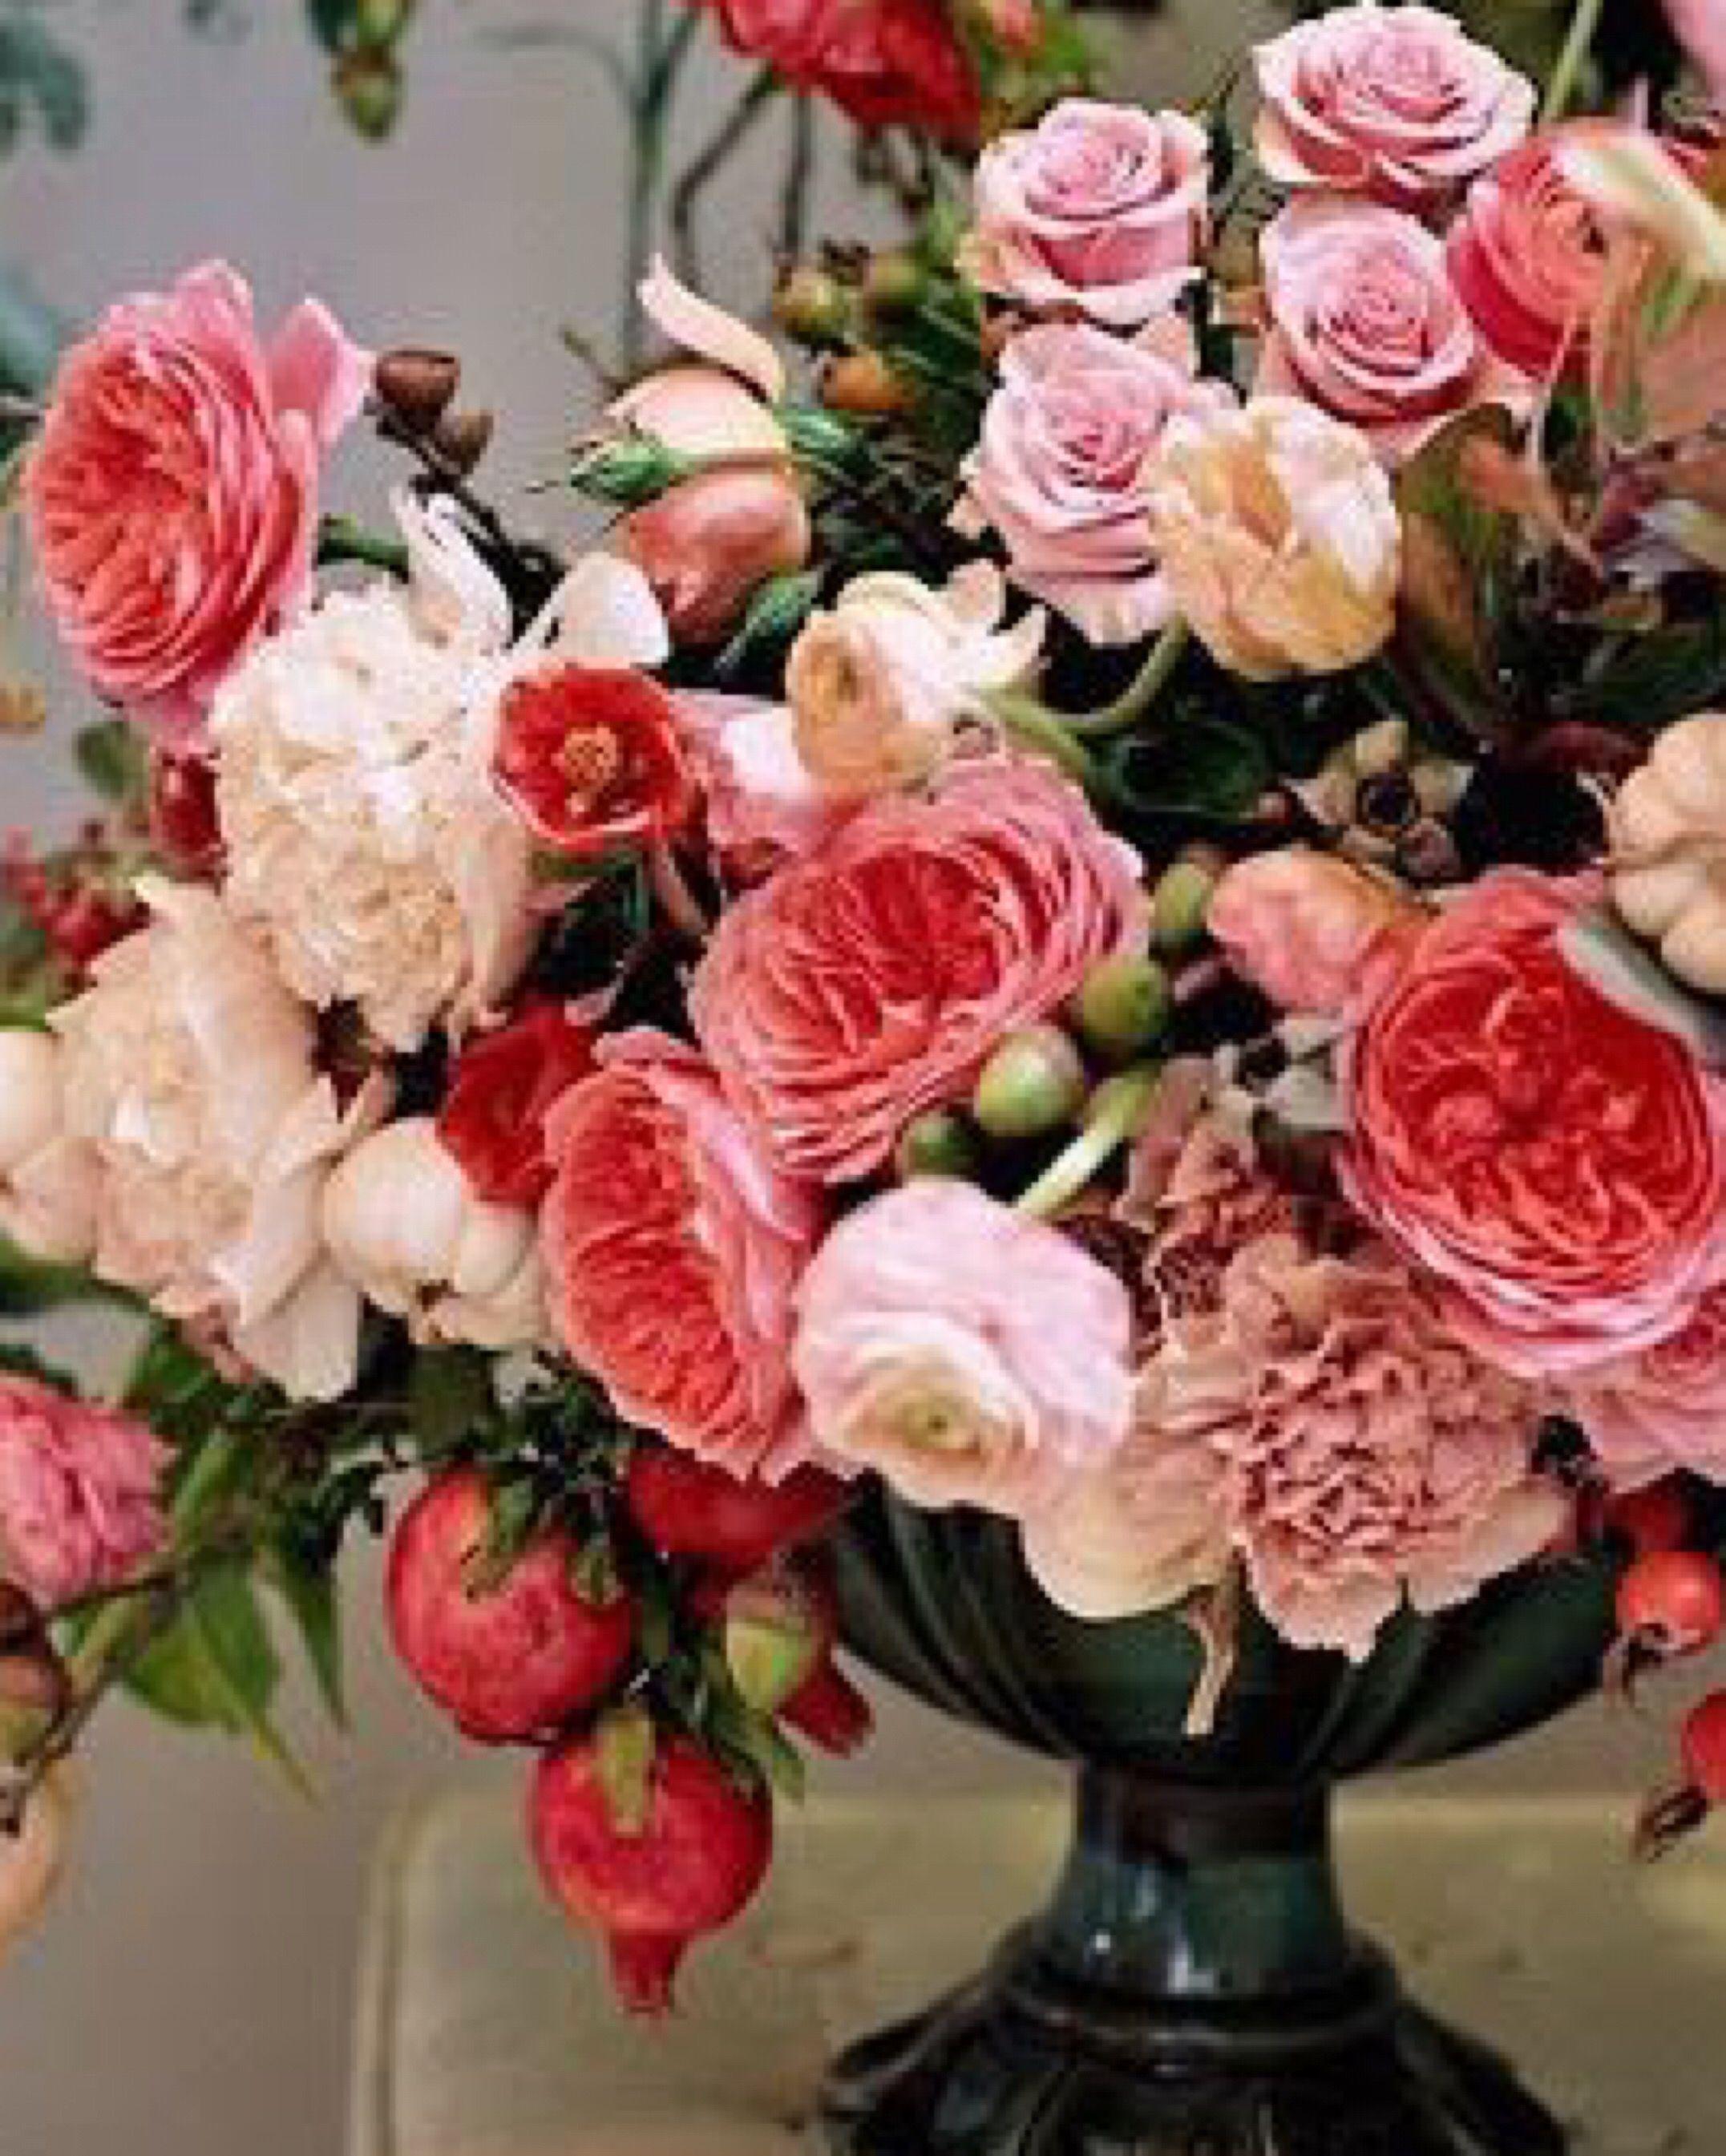 Flower Shops Decorations Floral Arrangements Cut Flowers Greenery Gift Boxes Beautiful Power Peach